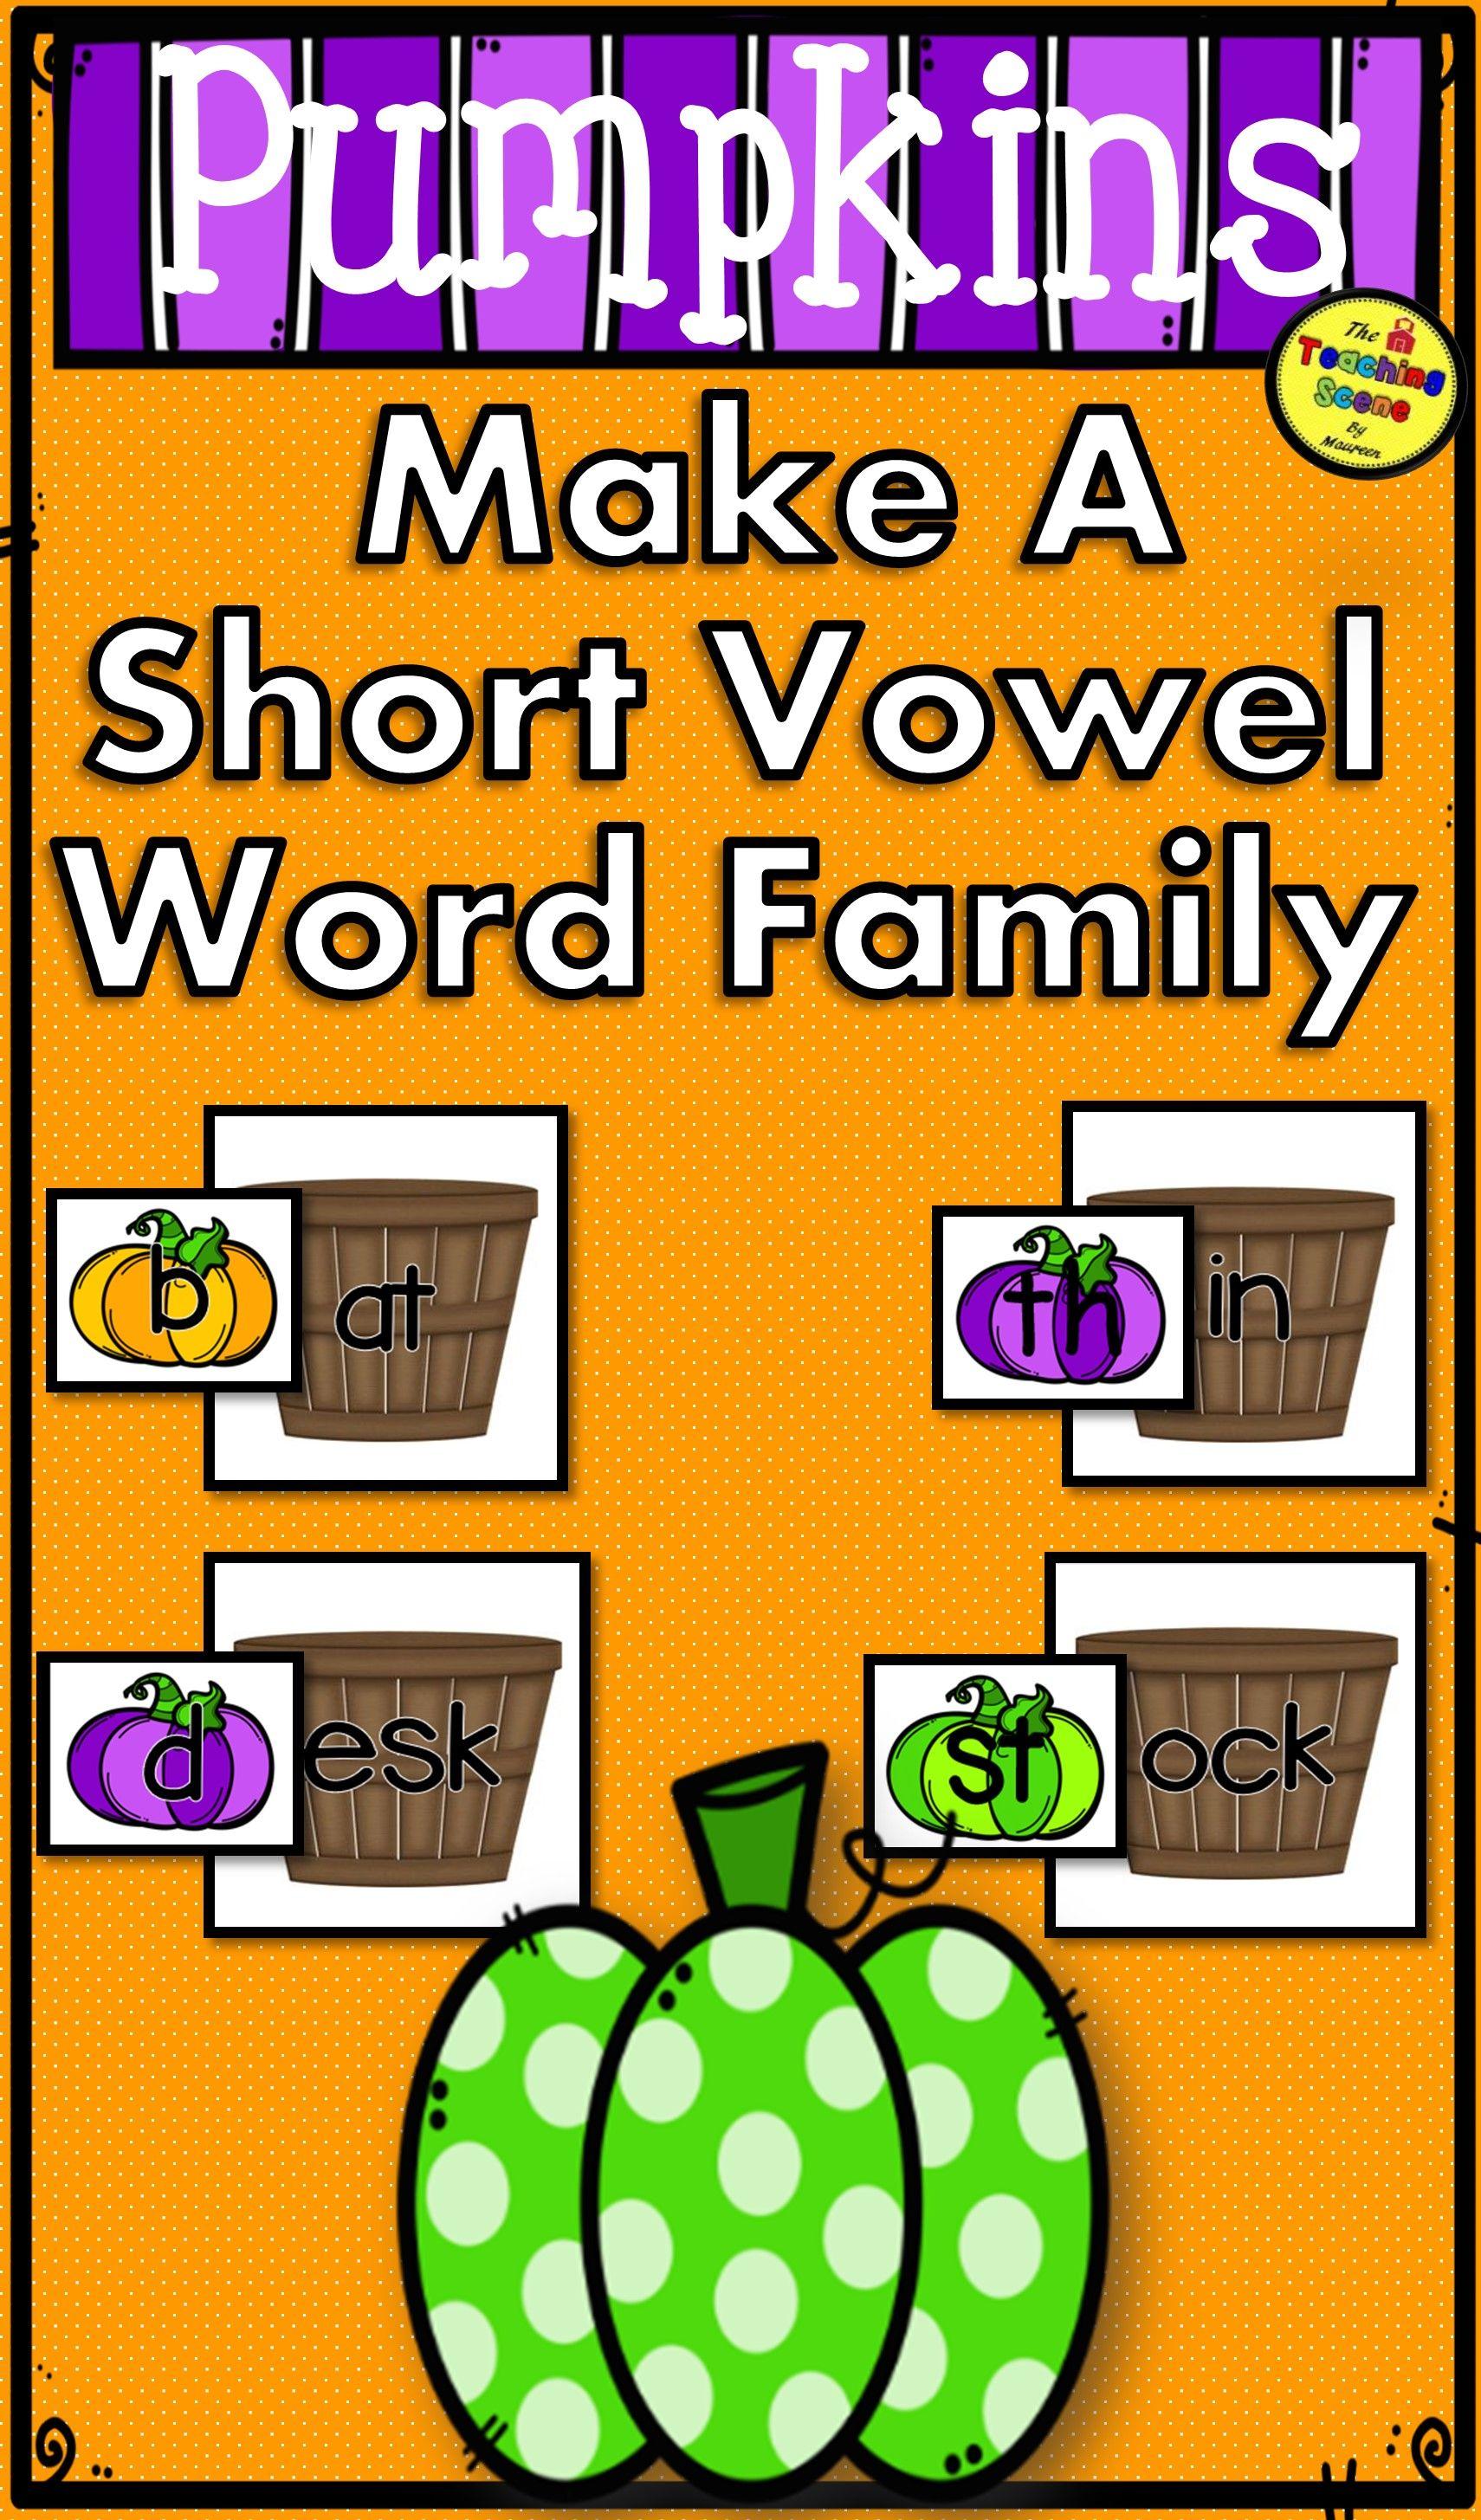 Pumpkins Make A Short Vowel Word Family Center